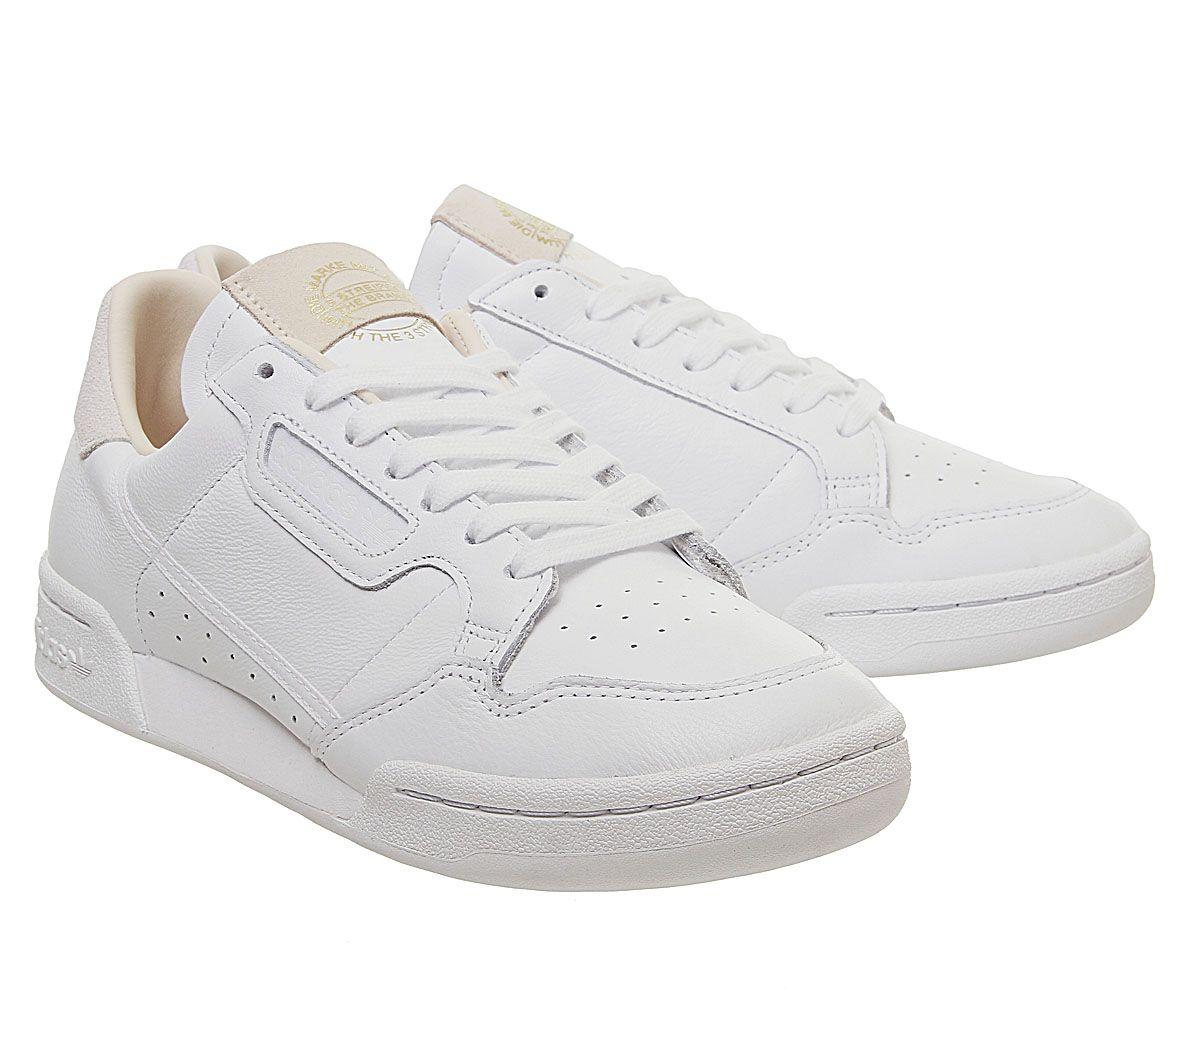 Adidas-Continental-80S-Scarpe-da-ginnastica-White-White-Scarpe-da-ginnastica-bianco-cristallo miniatura 7